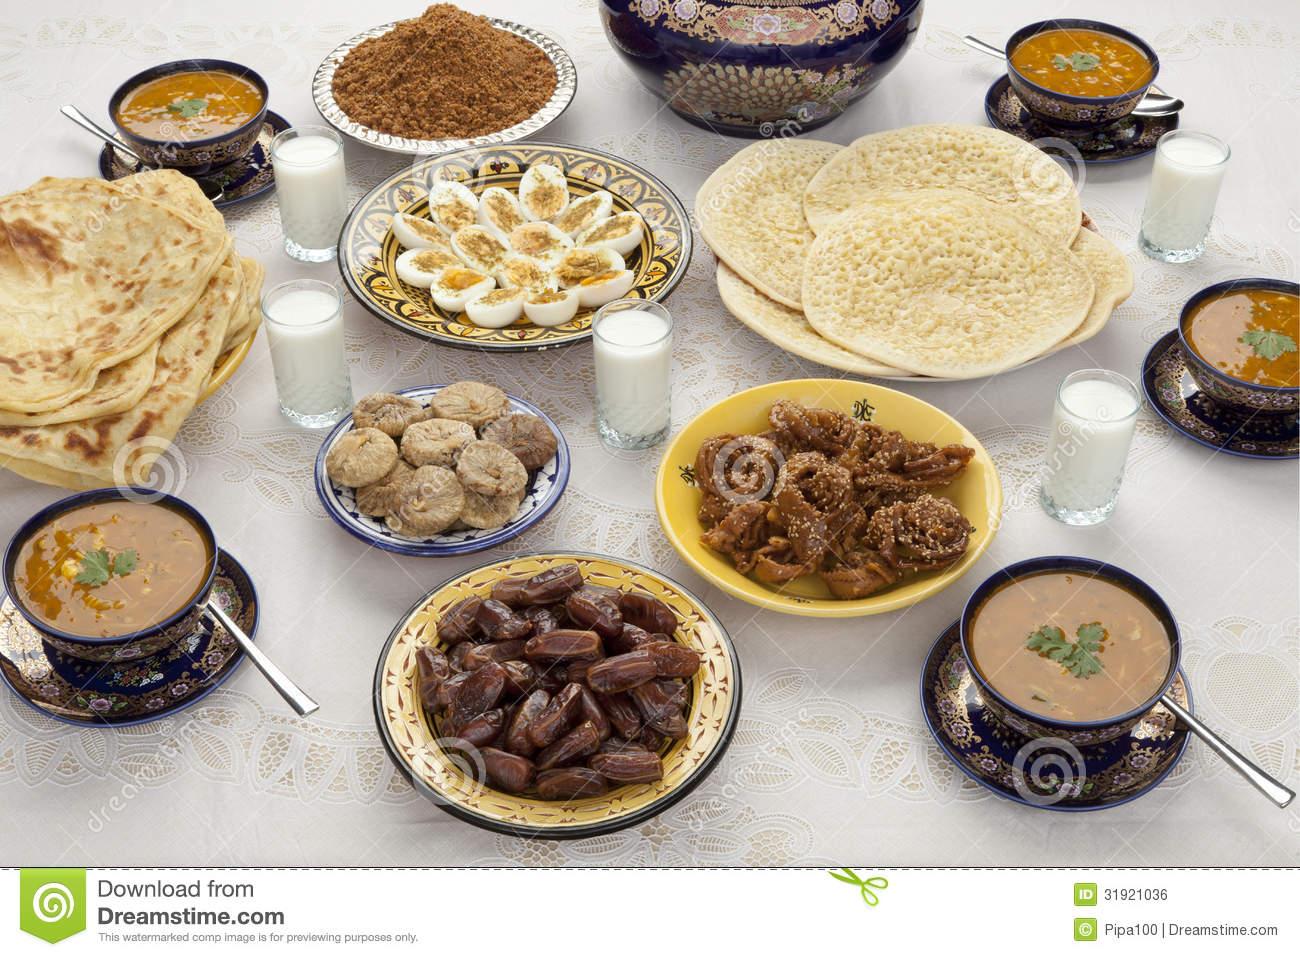 repas-marocain-traditionnel-pour-iftar-dans-ramadan-31921036